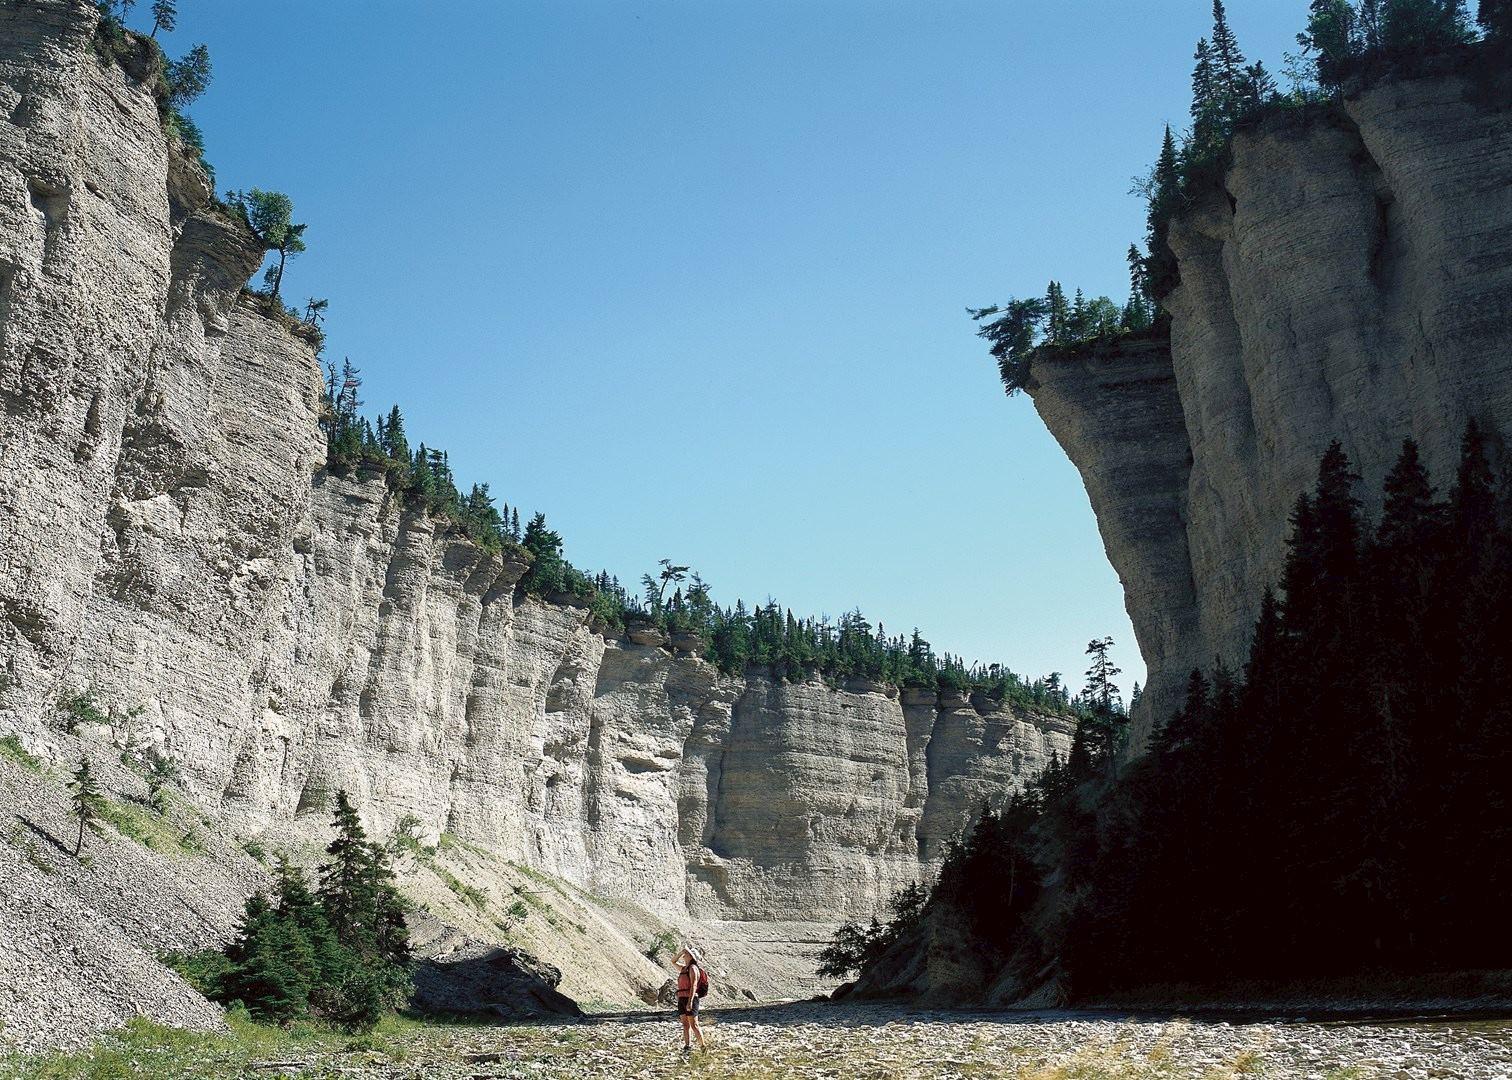 visit anticosti island on a trip to canada